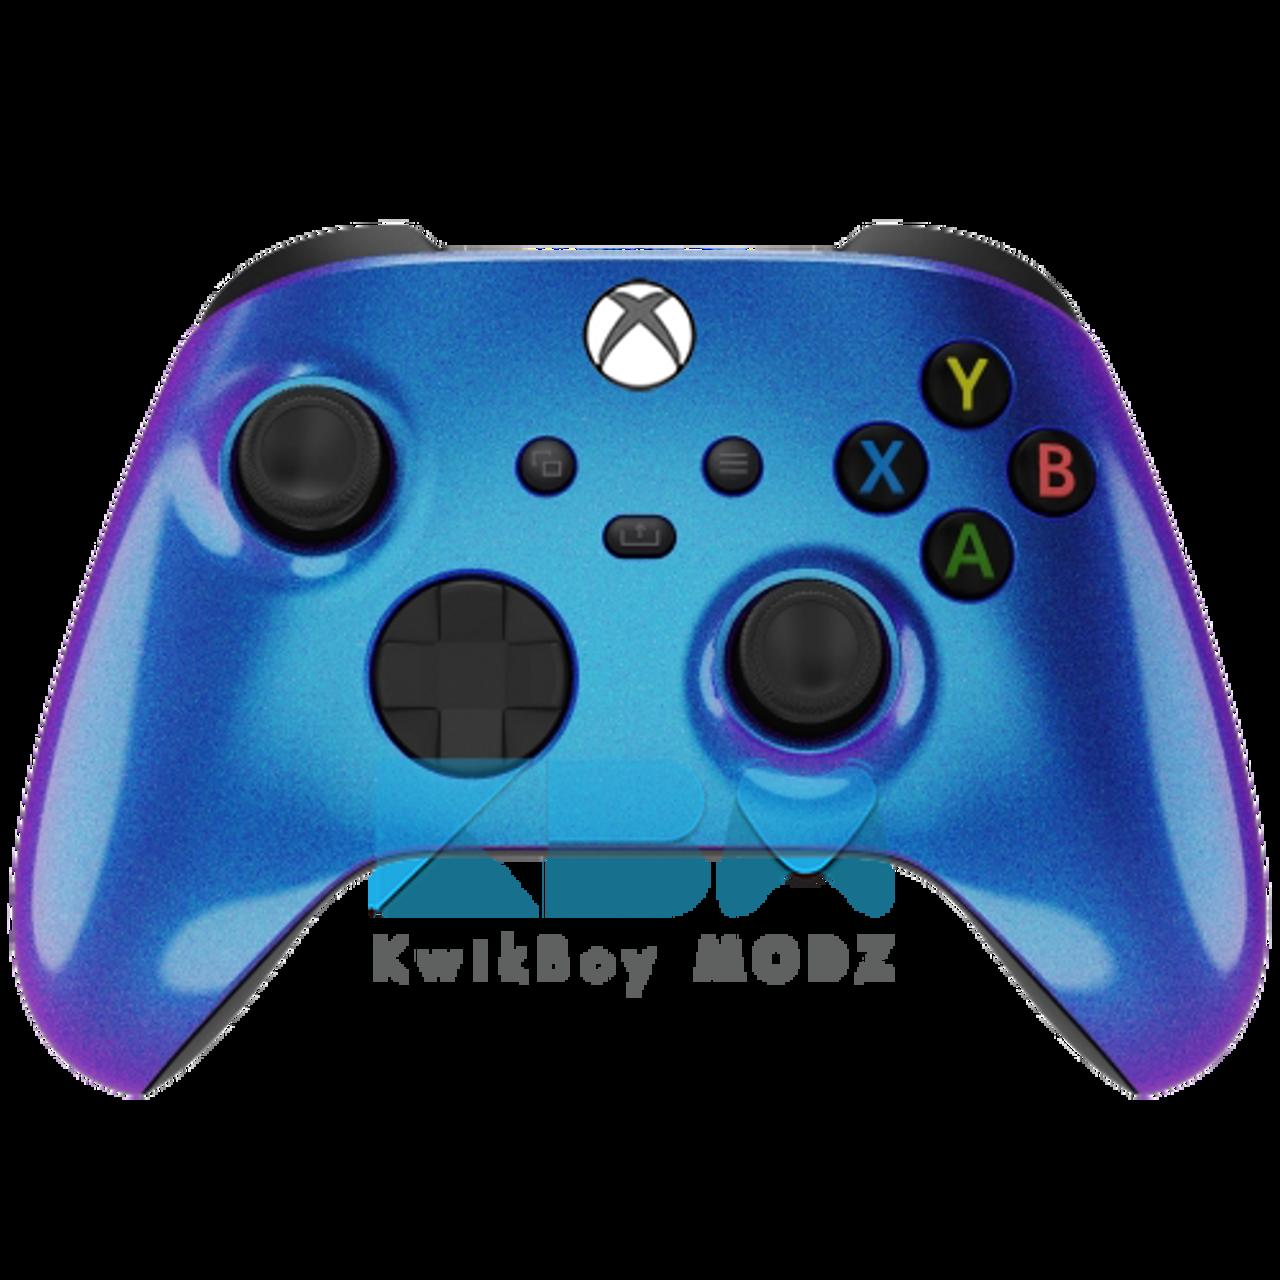 New Yellow Chameleon Custom Xbox One S Controller